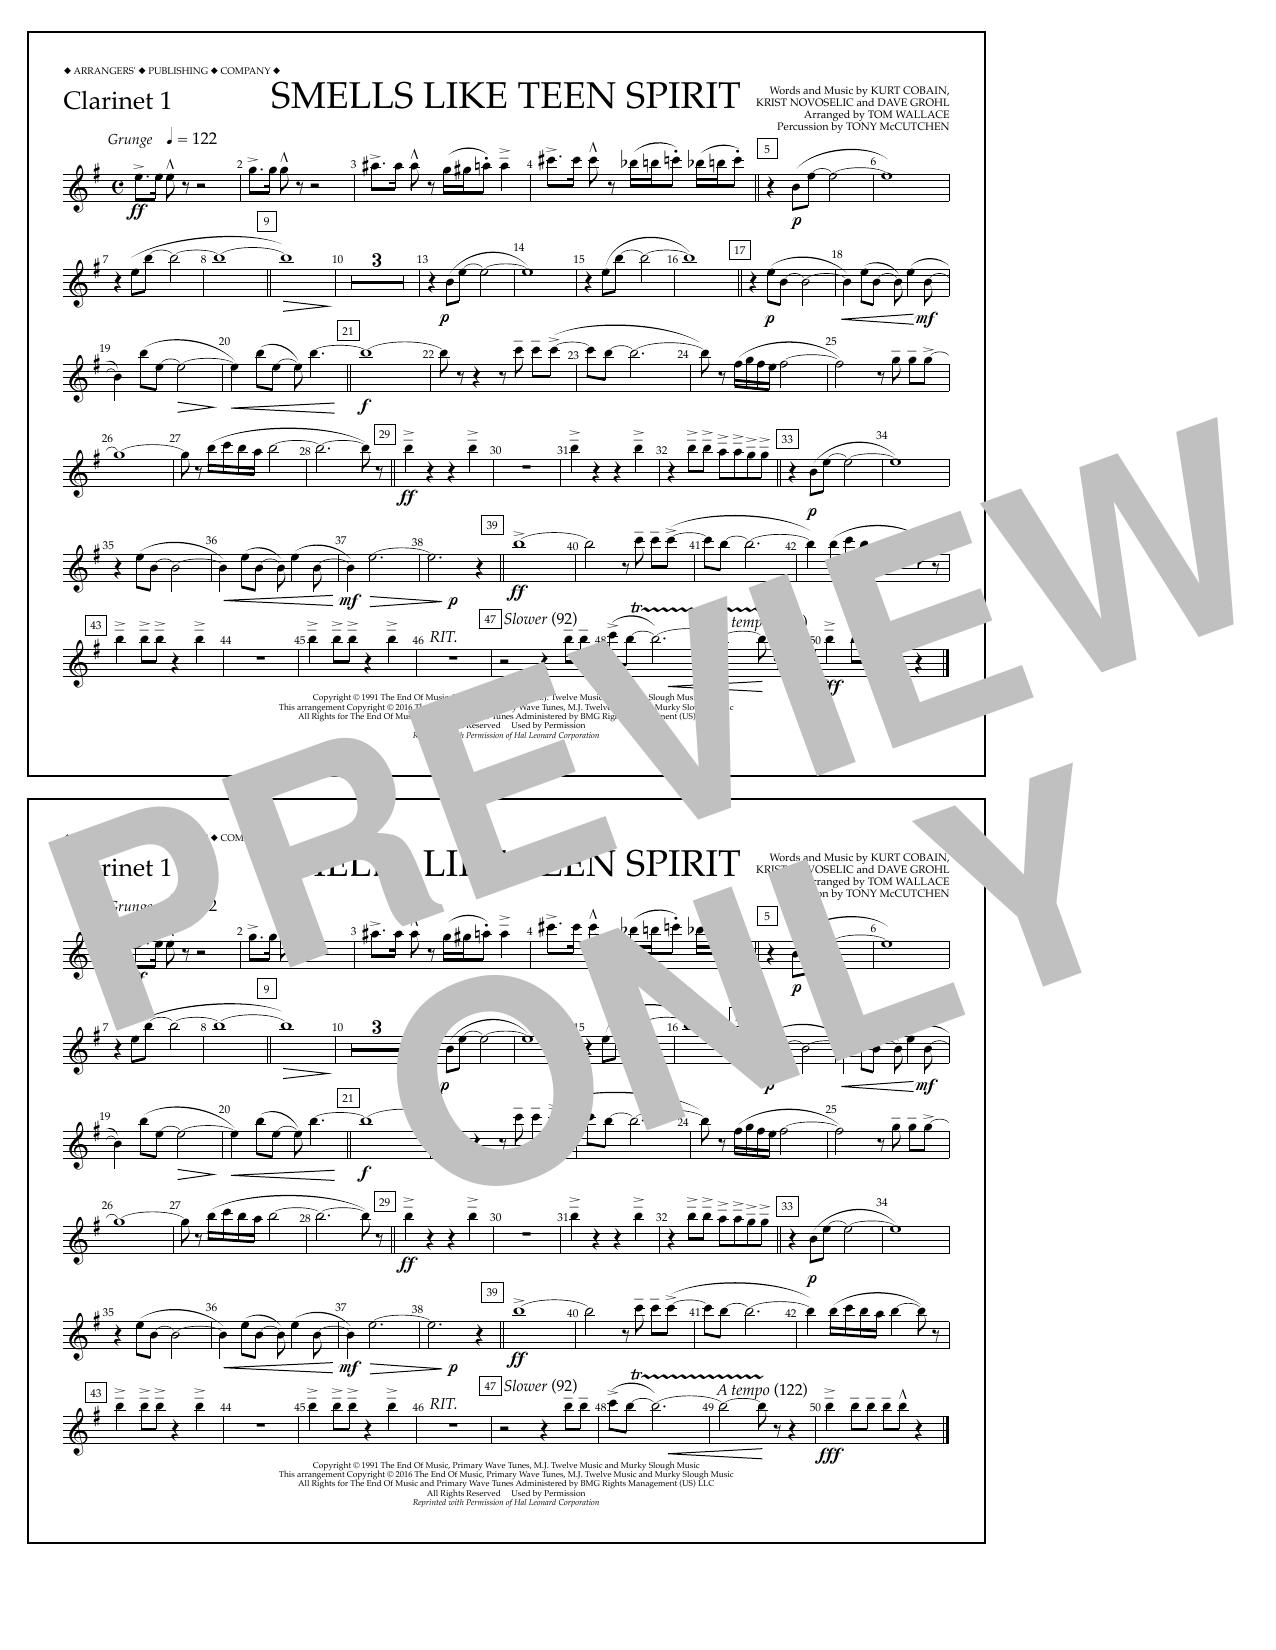 Nirvana - Smells Like Teen Spirit - Clarinet 1